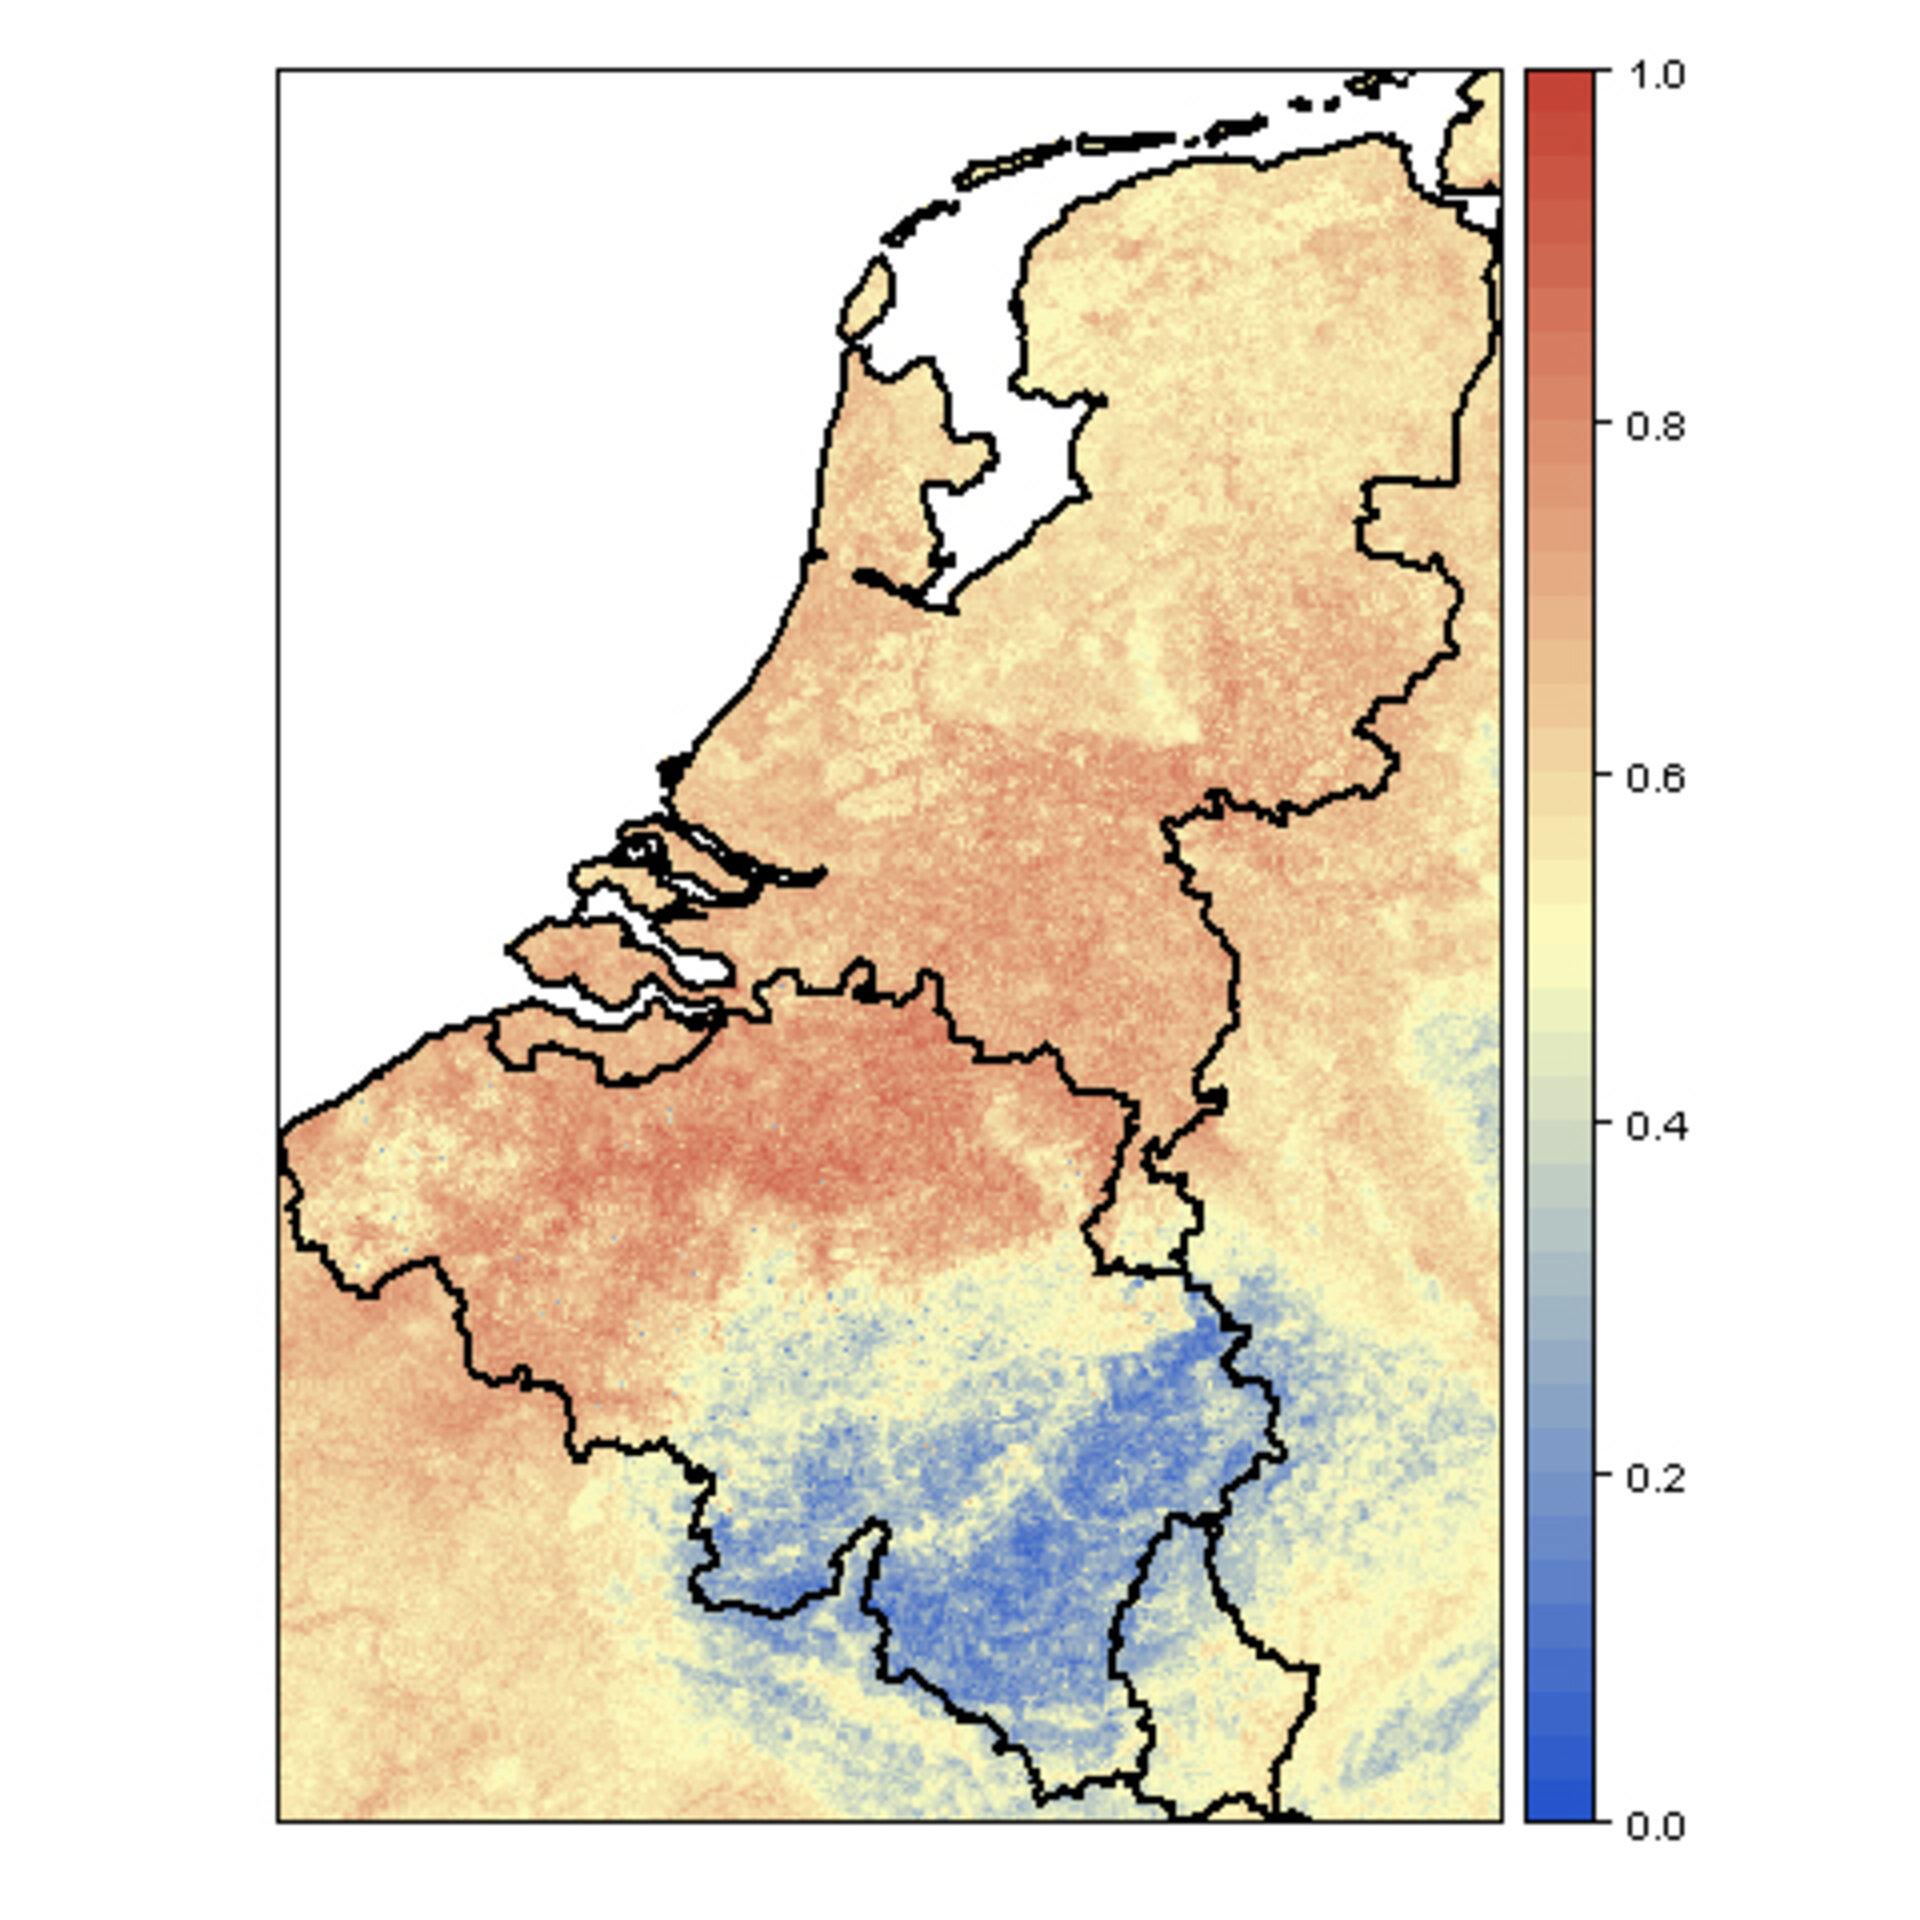 Muggen verspreiding in Nederland en Belgie